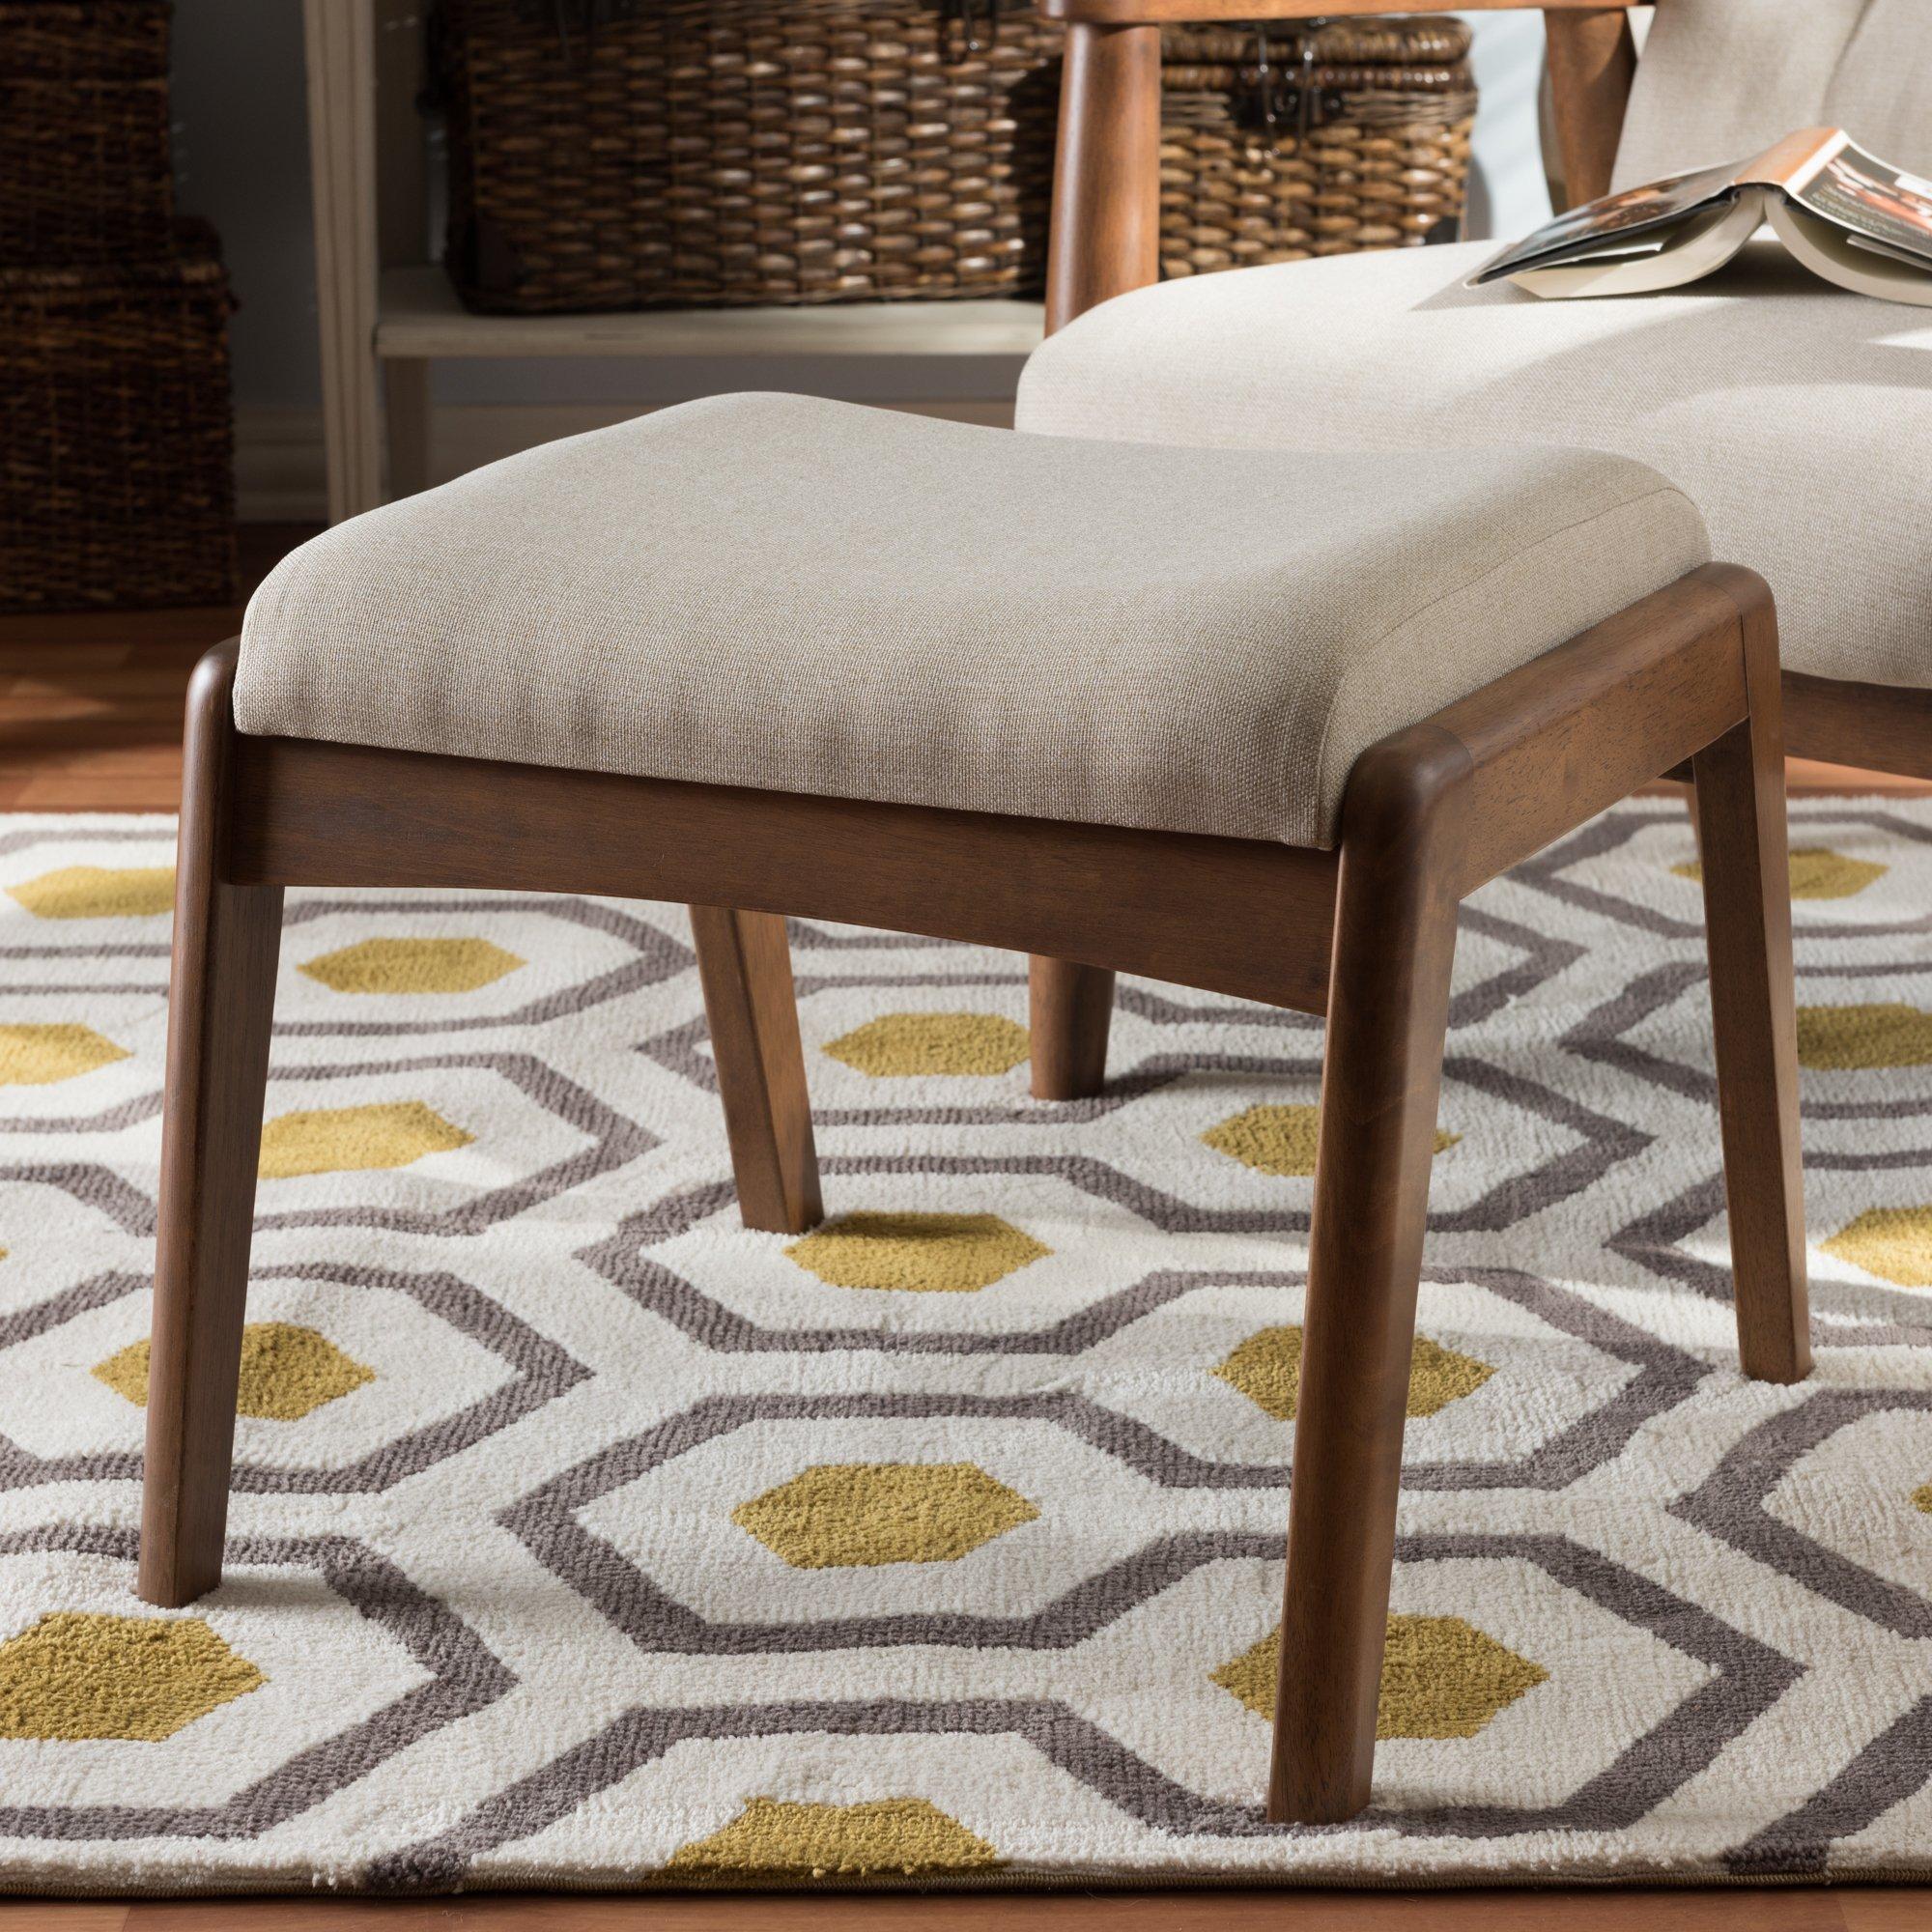 Baxton Studio Roxy Mid-Century Modern Walnut Wood Finishing and Light Beige Fabric Upholstered Ottoman